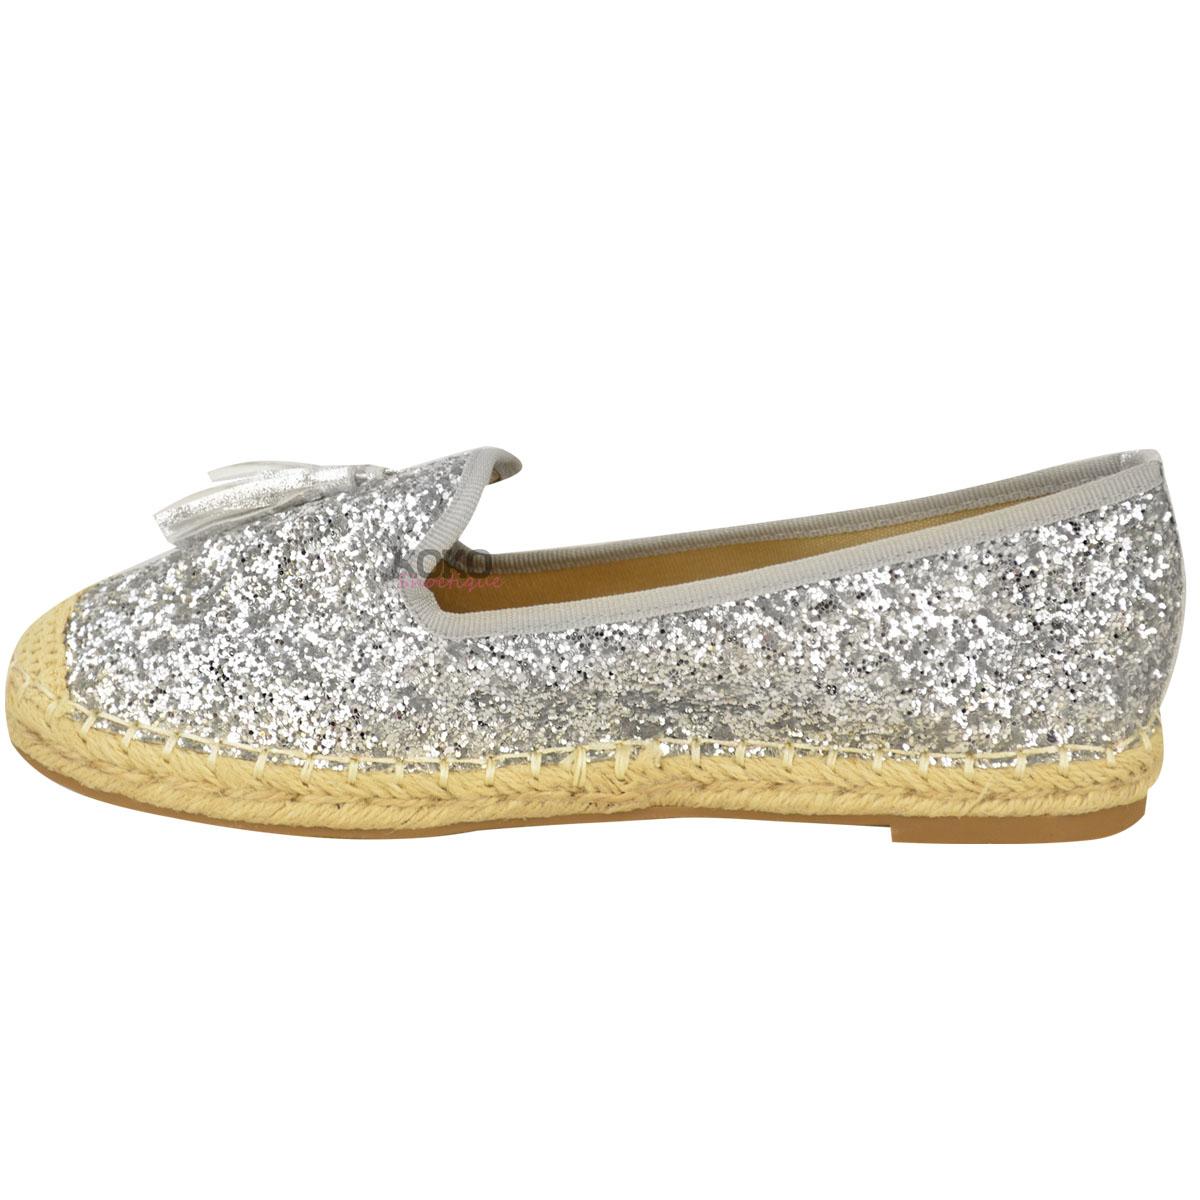 womens flat glitter tassel espadrilles slip on